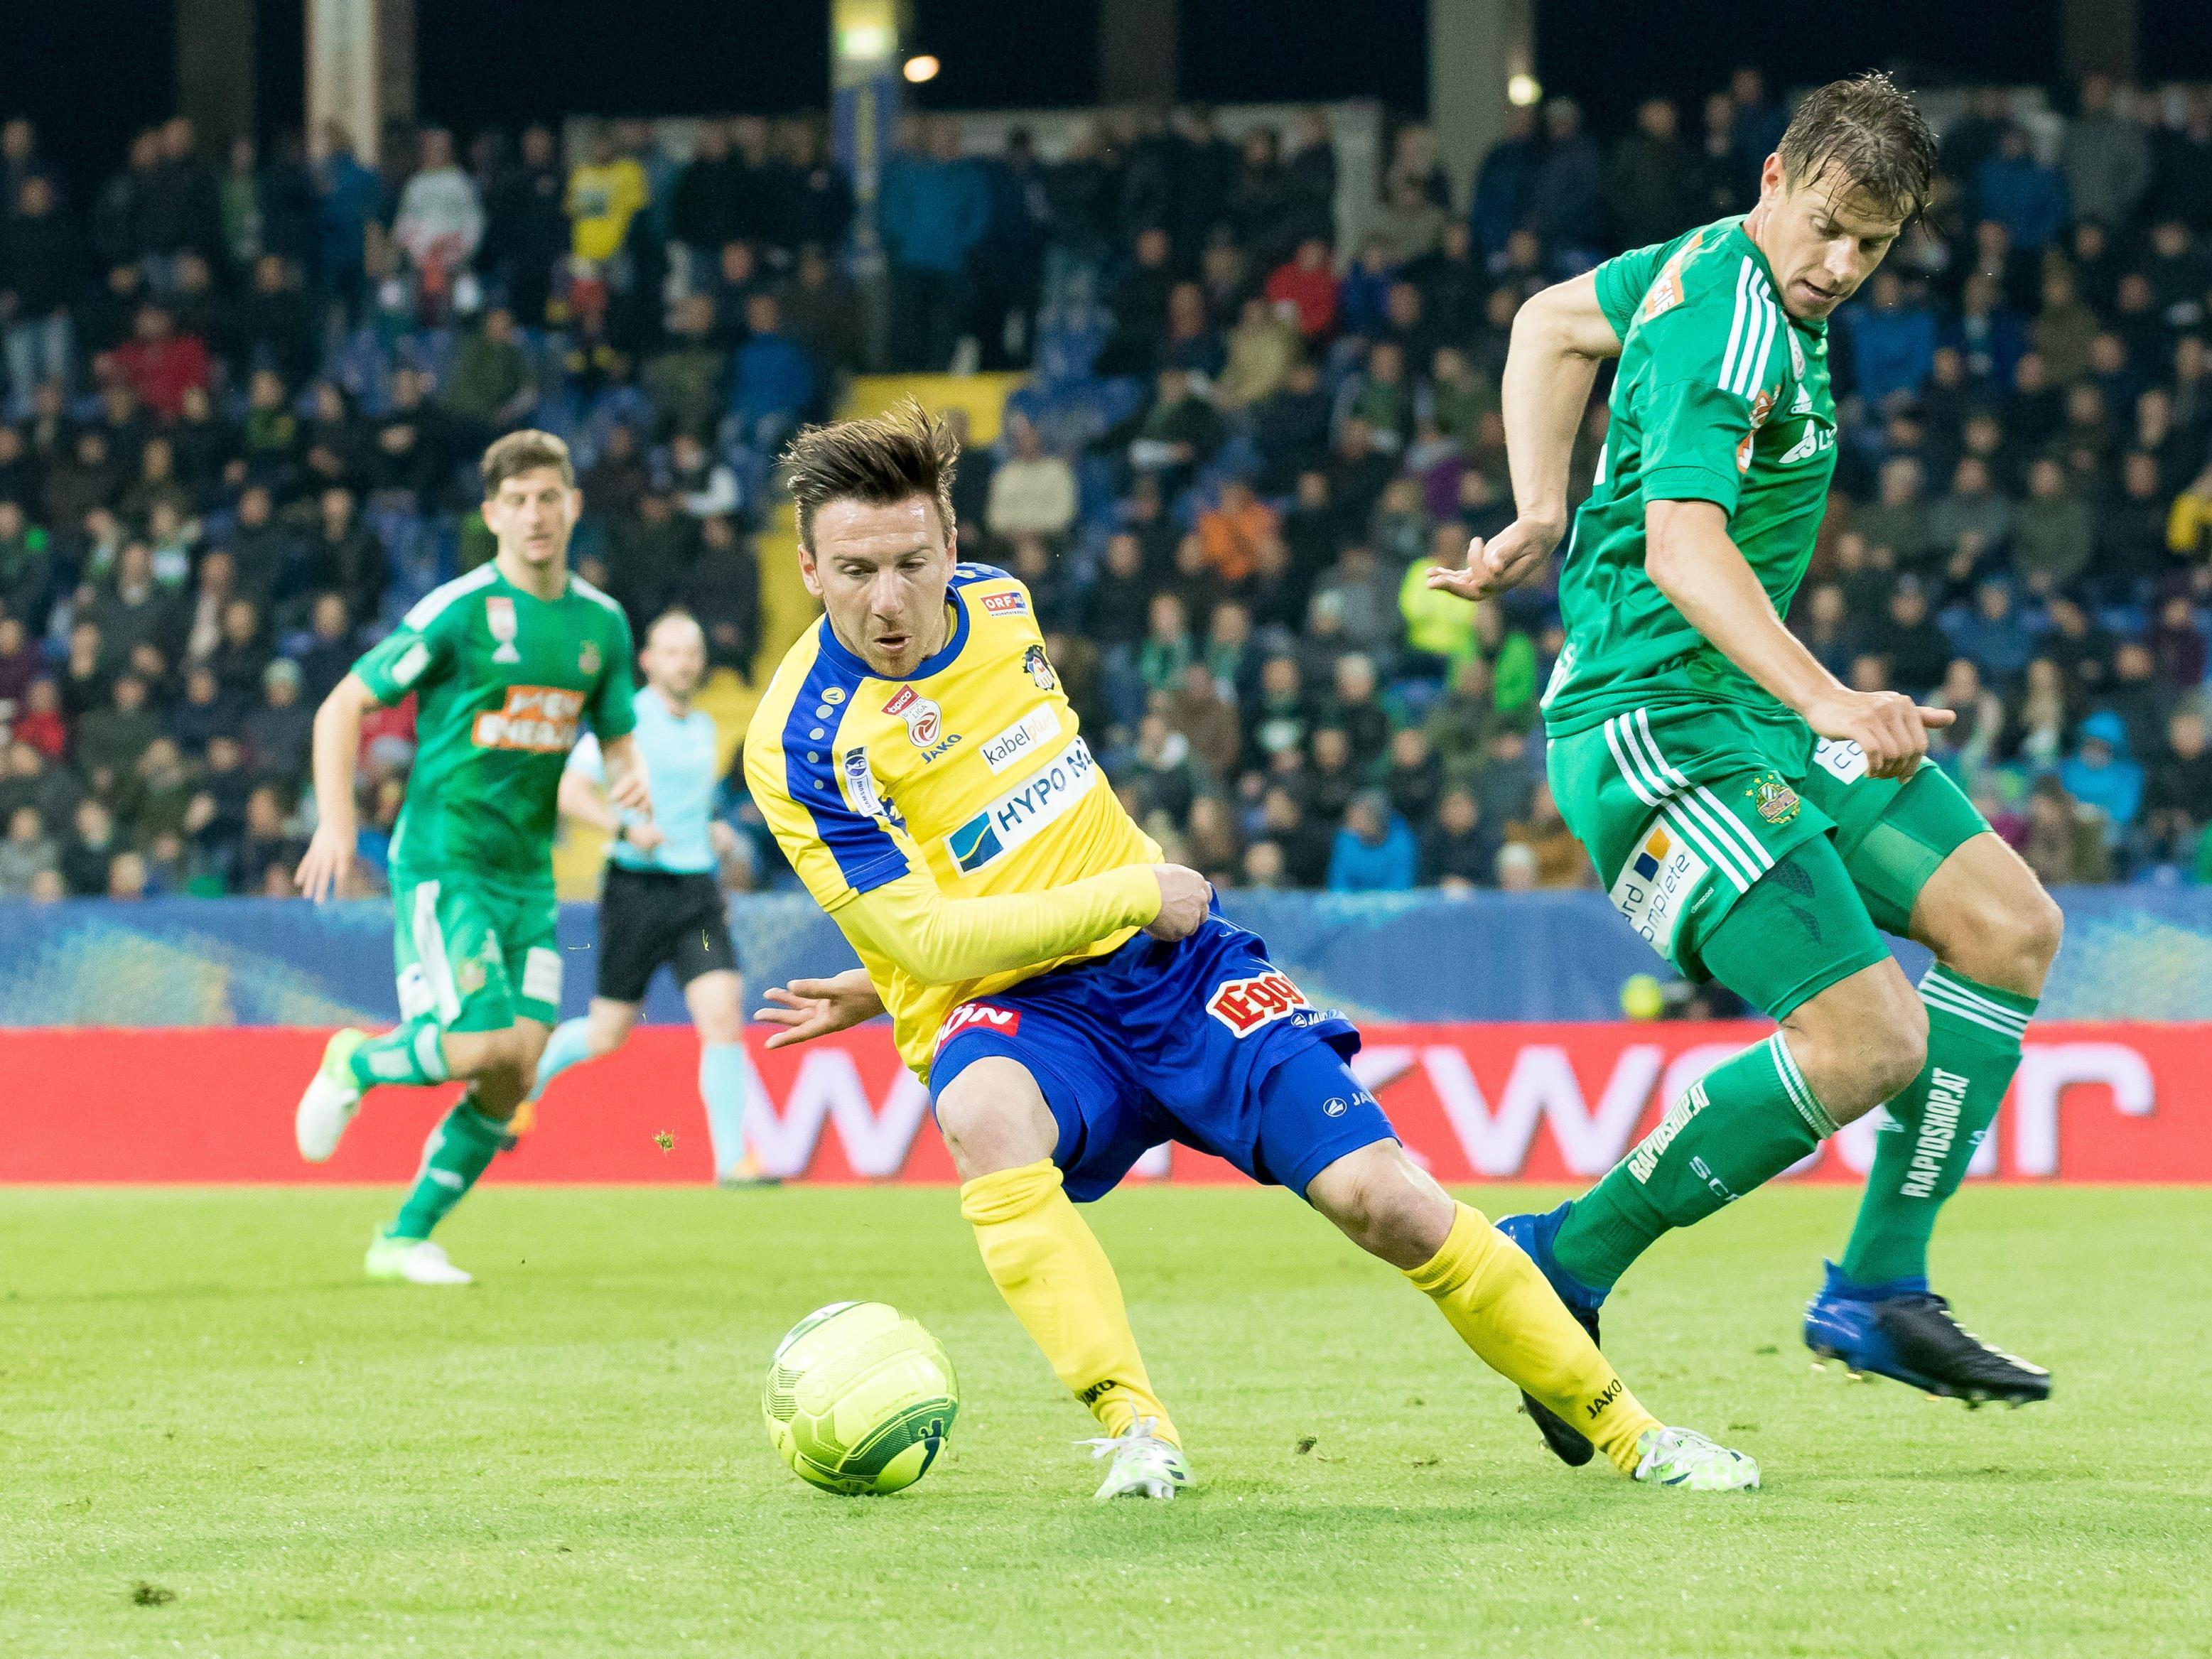 Rapid empfängt zum Saisonabschluss den SKN St. Pölten.